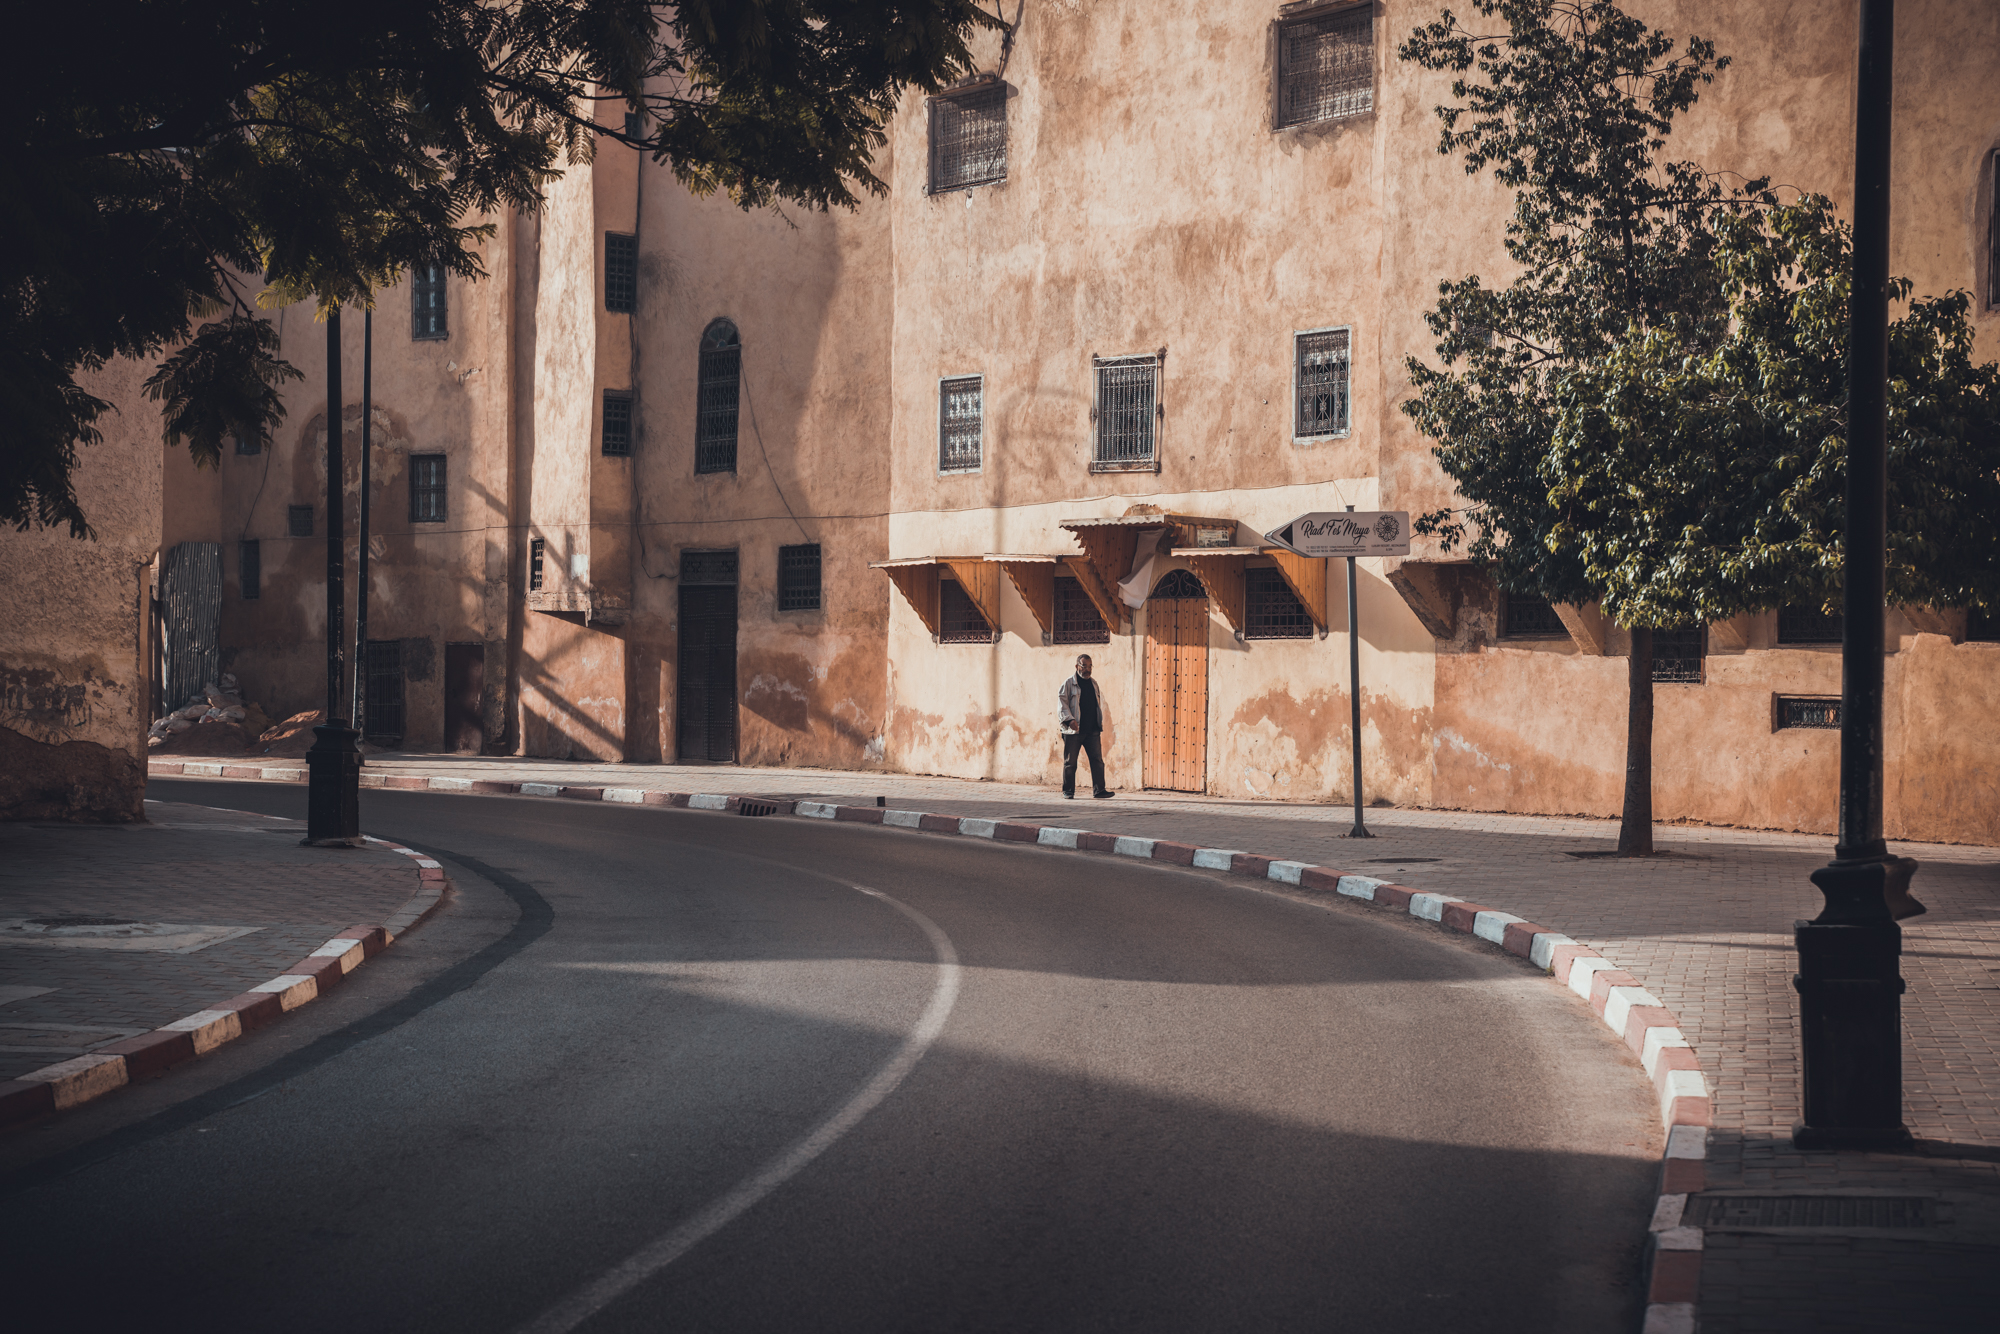 StijnHoekstra_Marocco-5.jpg